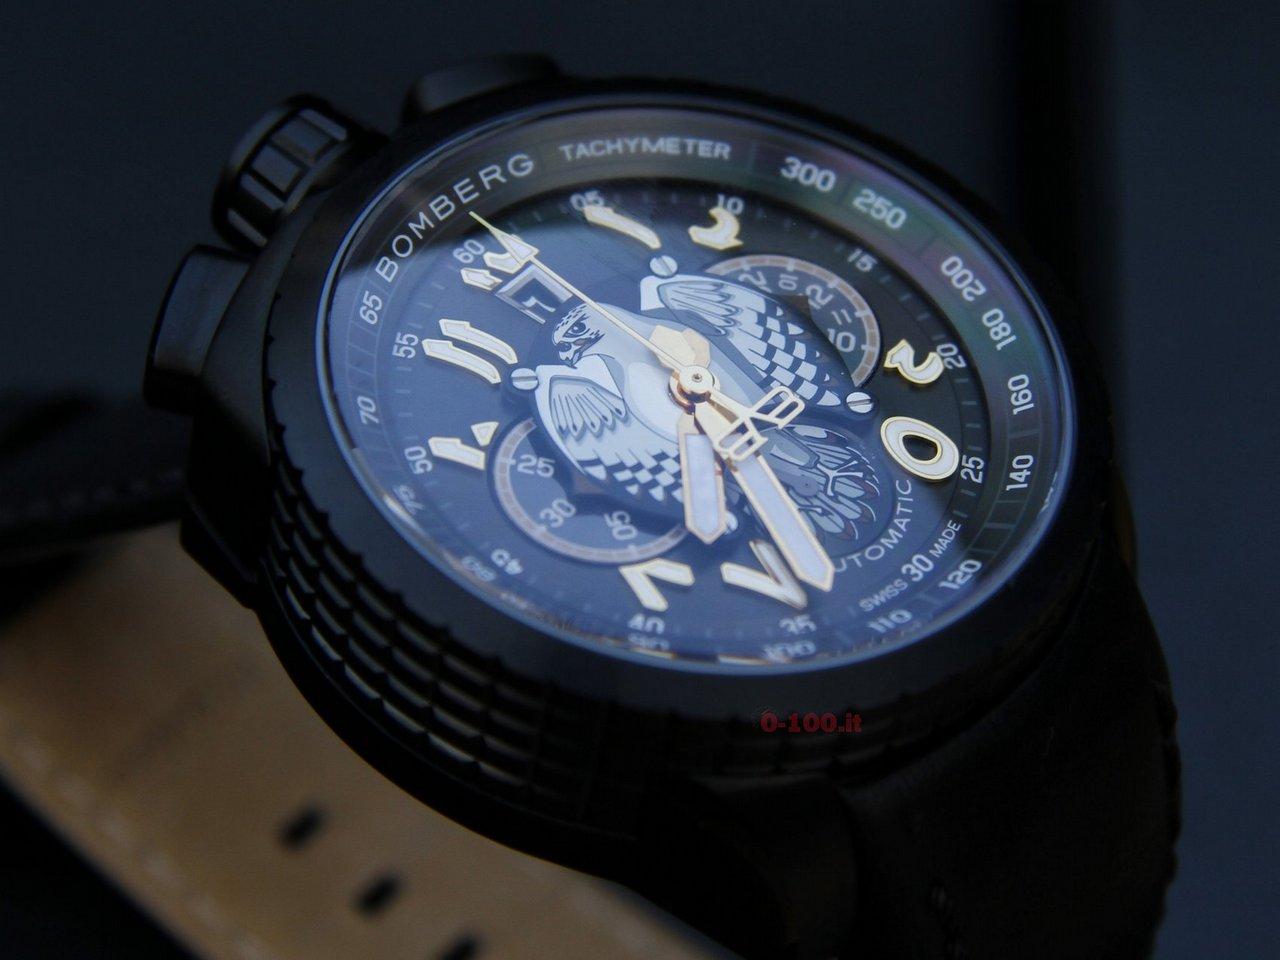 baselworld-2015_bomberg-bolt-68-falcon-chronograph_0-100-5